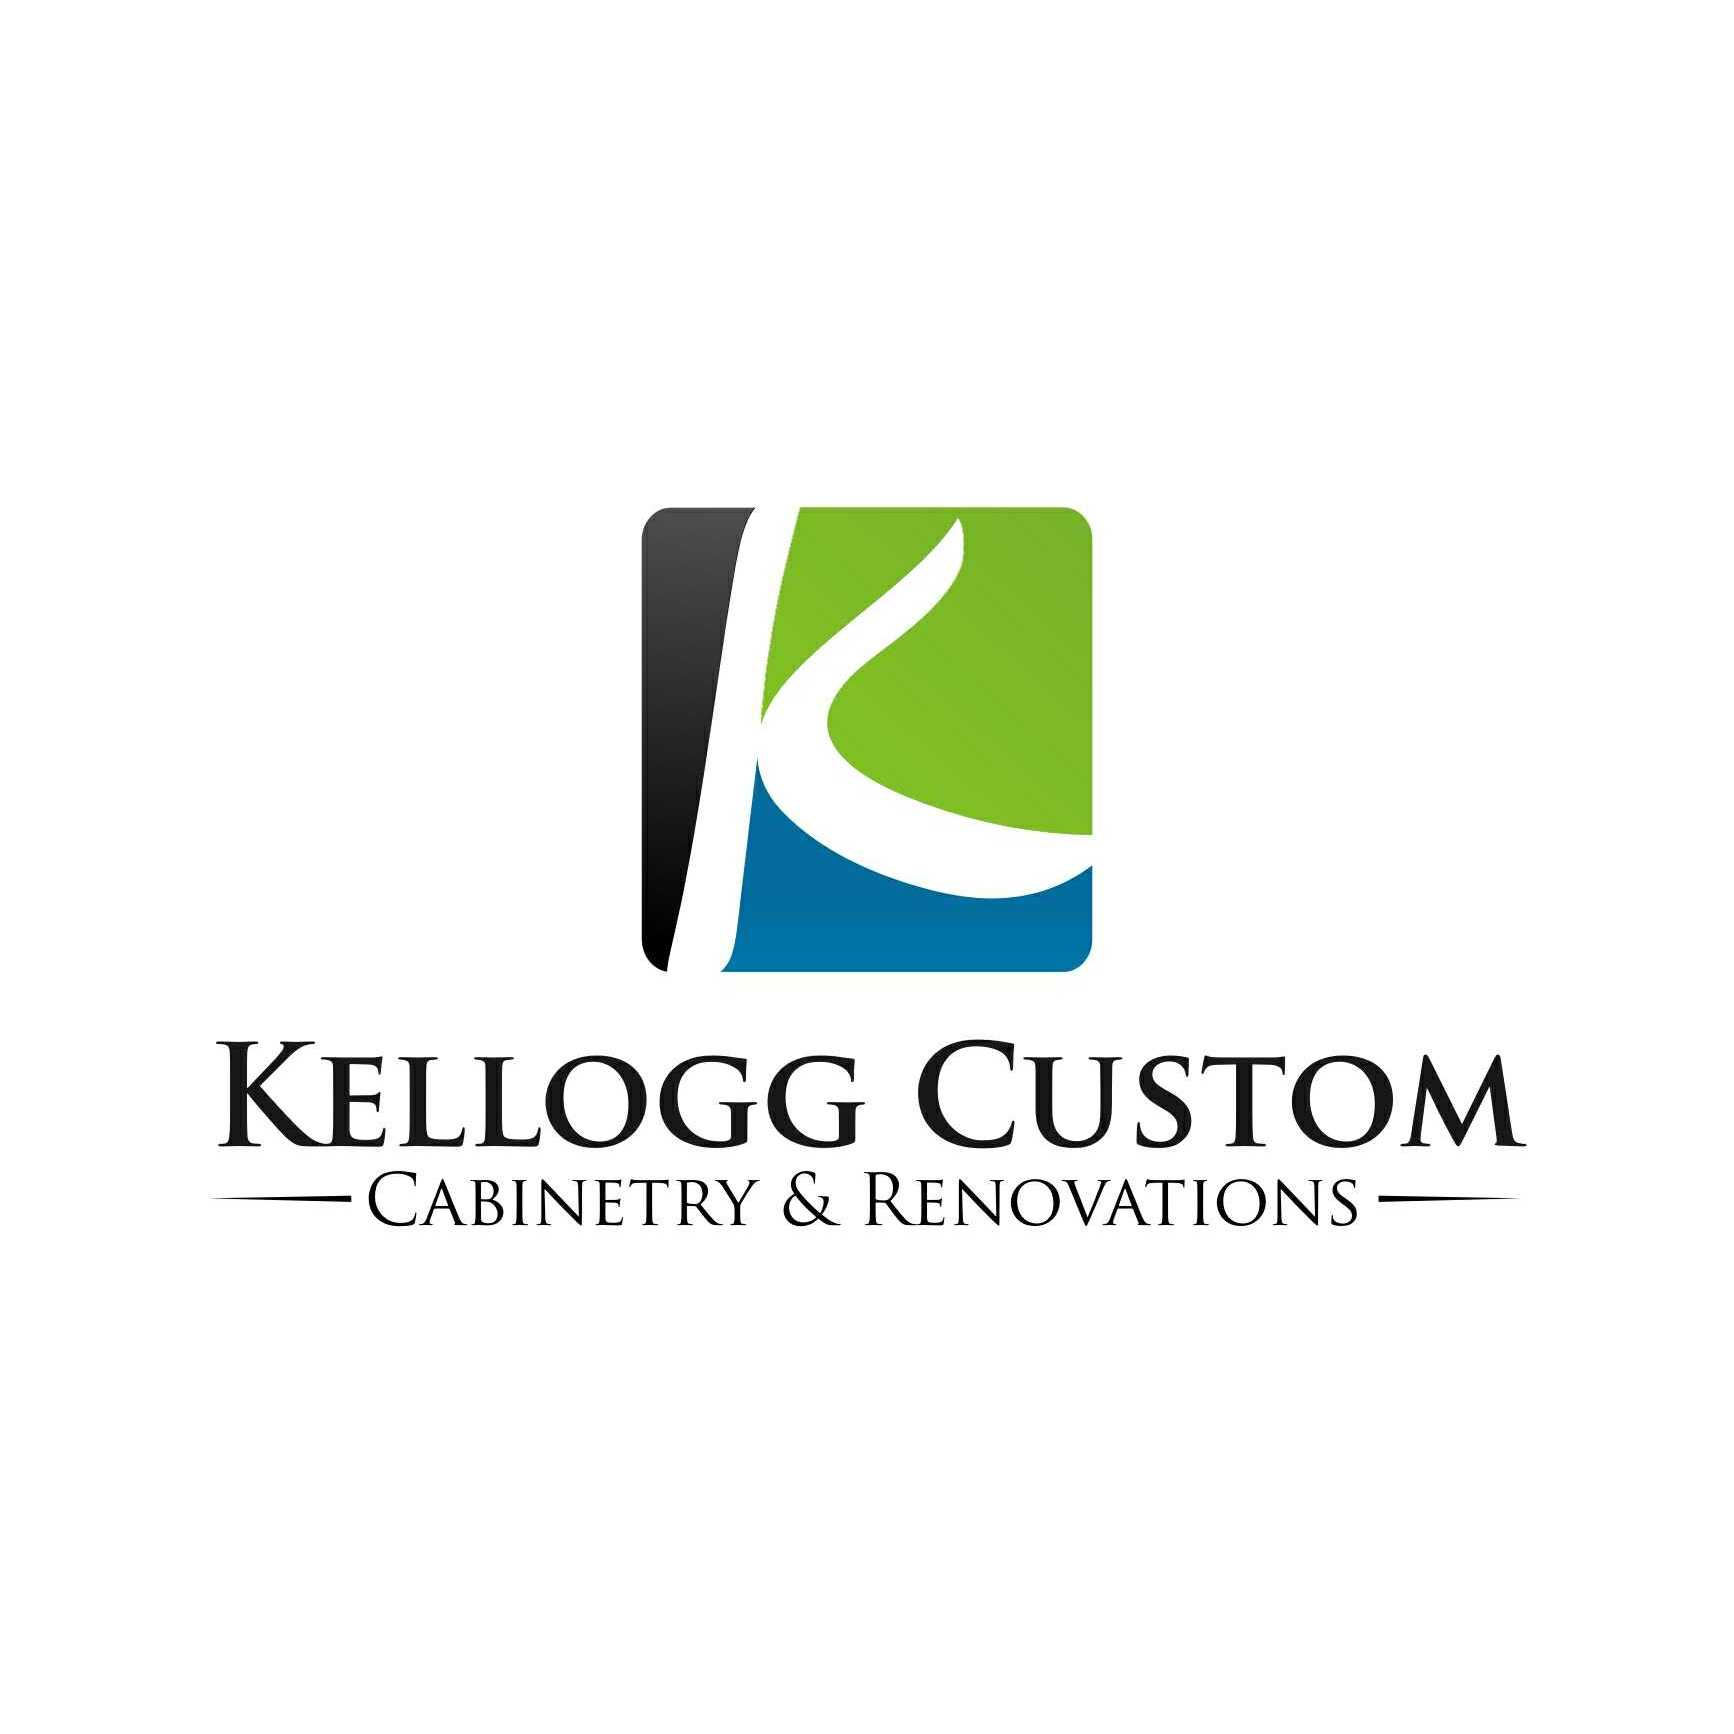 Kellogg Custom Cabinetry & Renovations, Inc